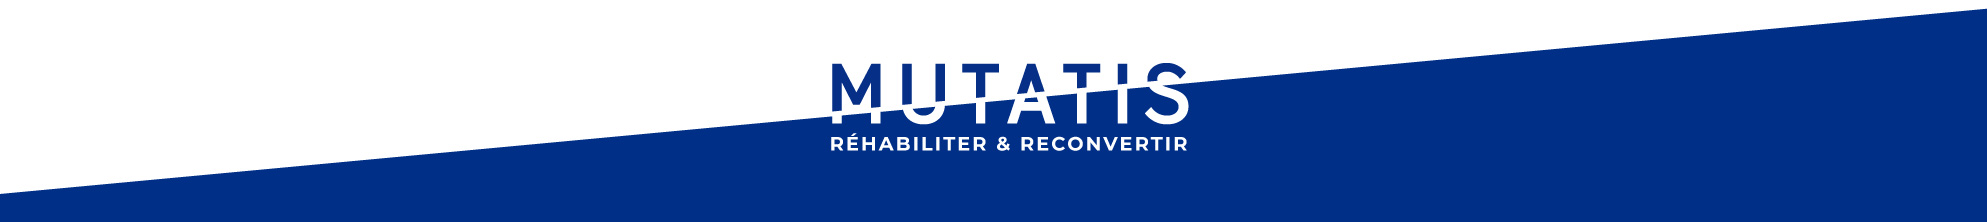 mutatis-rehabiliter-et-reconvertir-footer